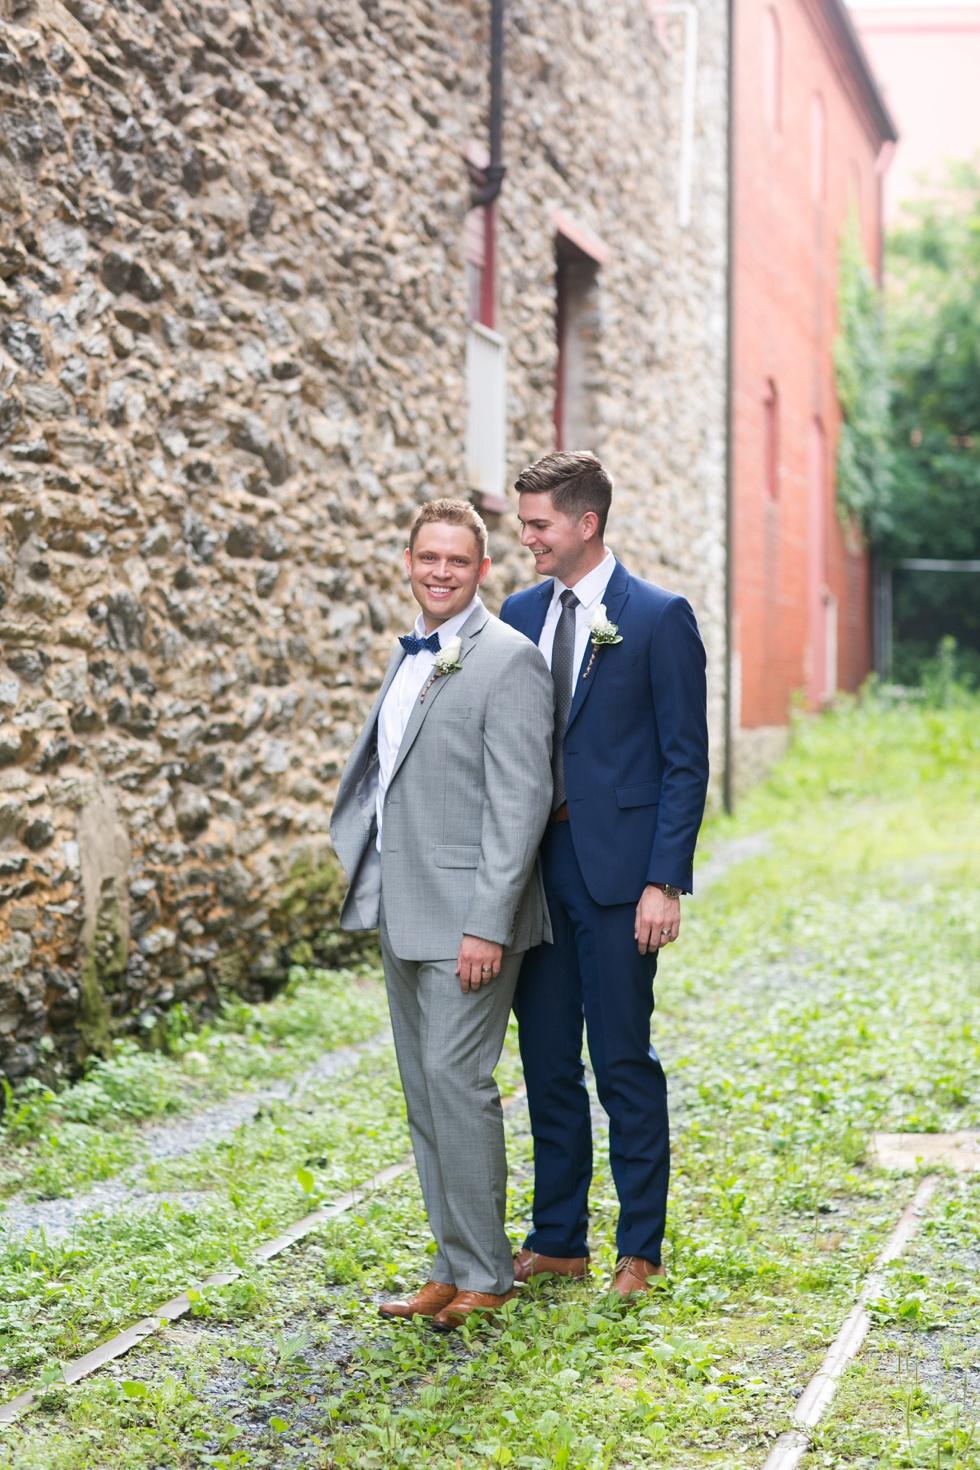 Frederick wedding - Best LGBT Wedding photographer of 2015